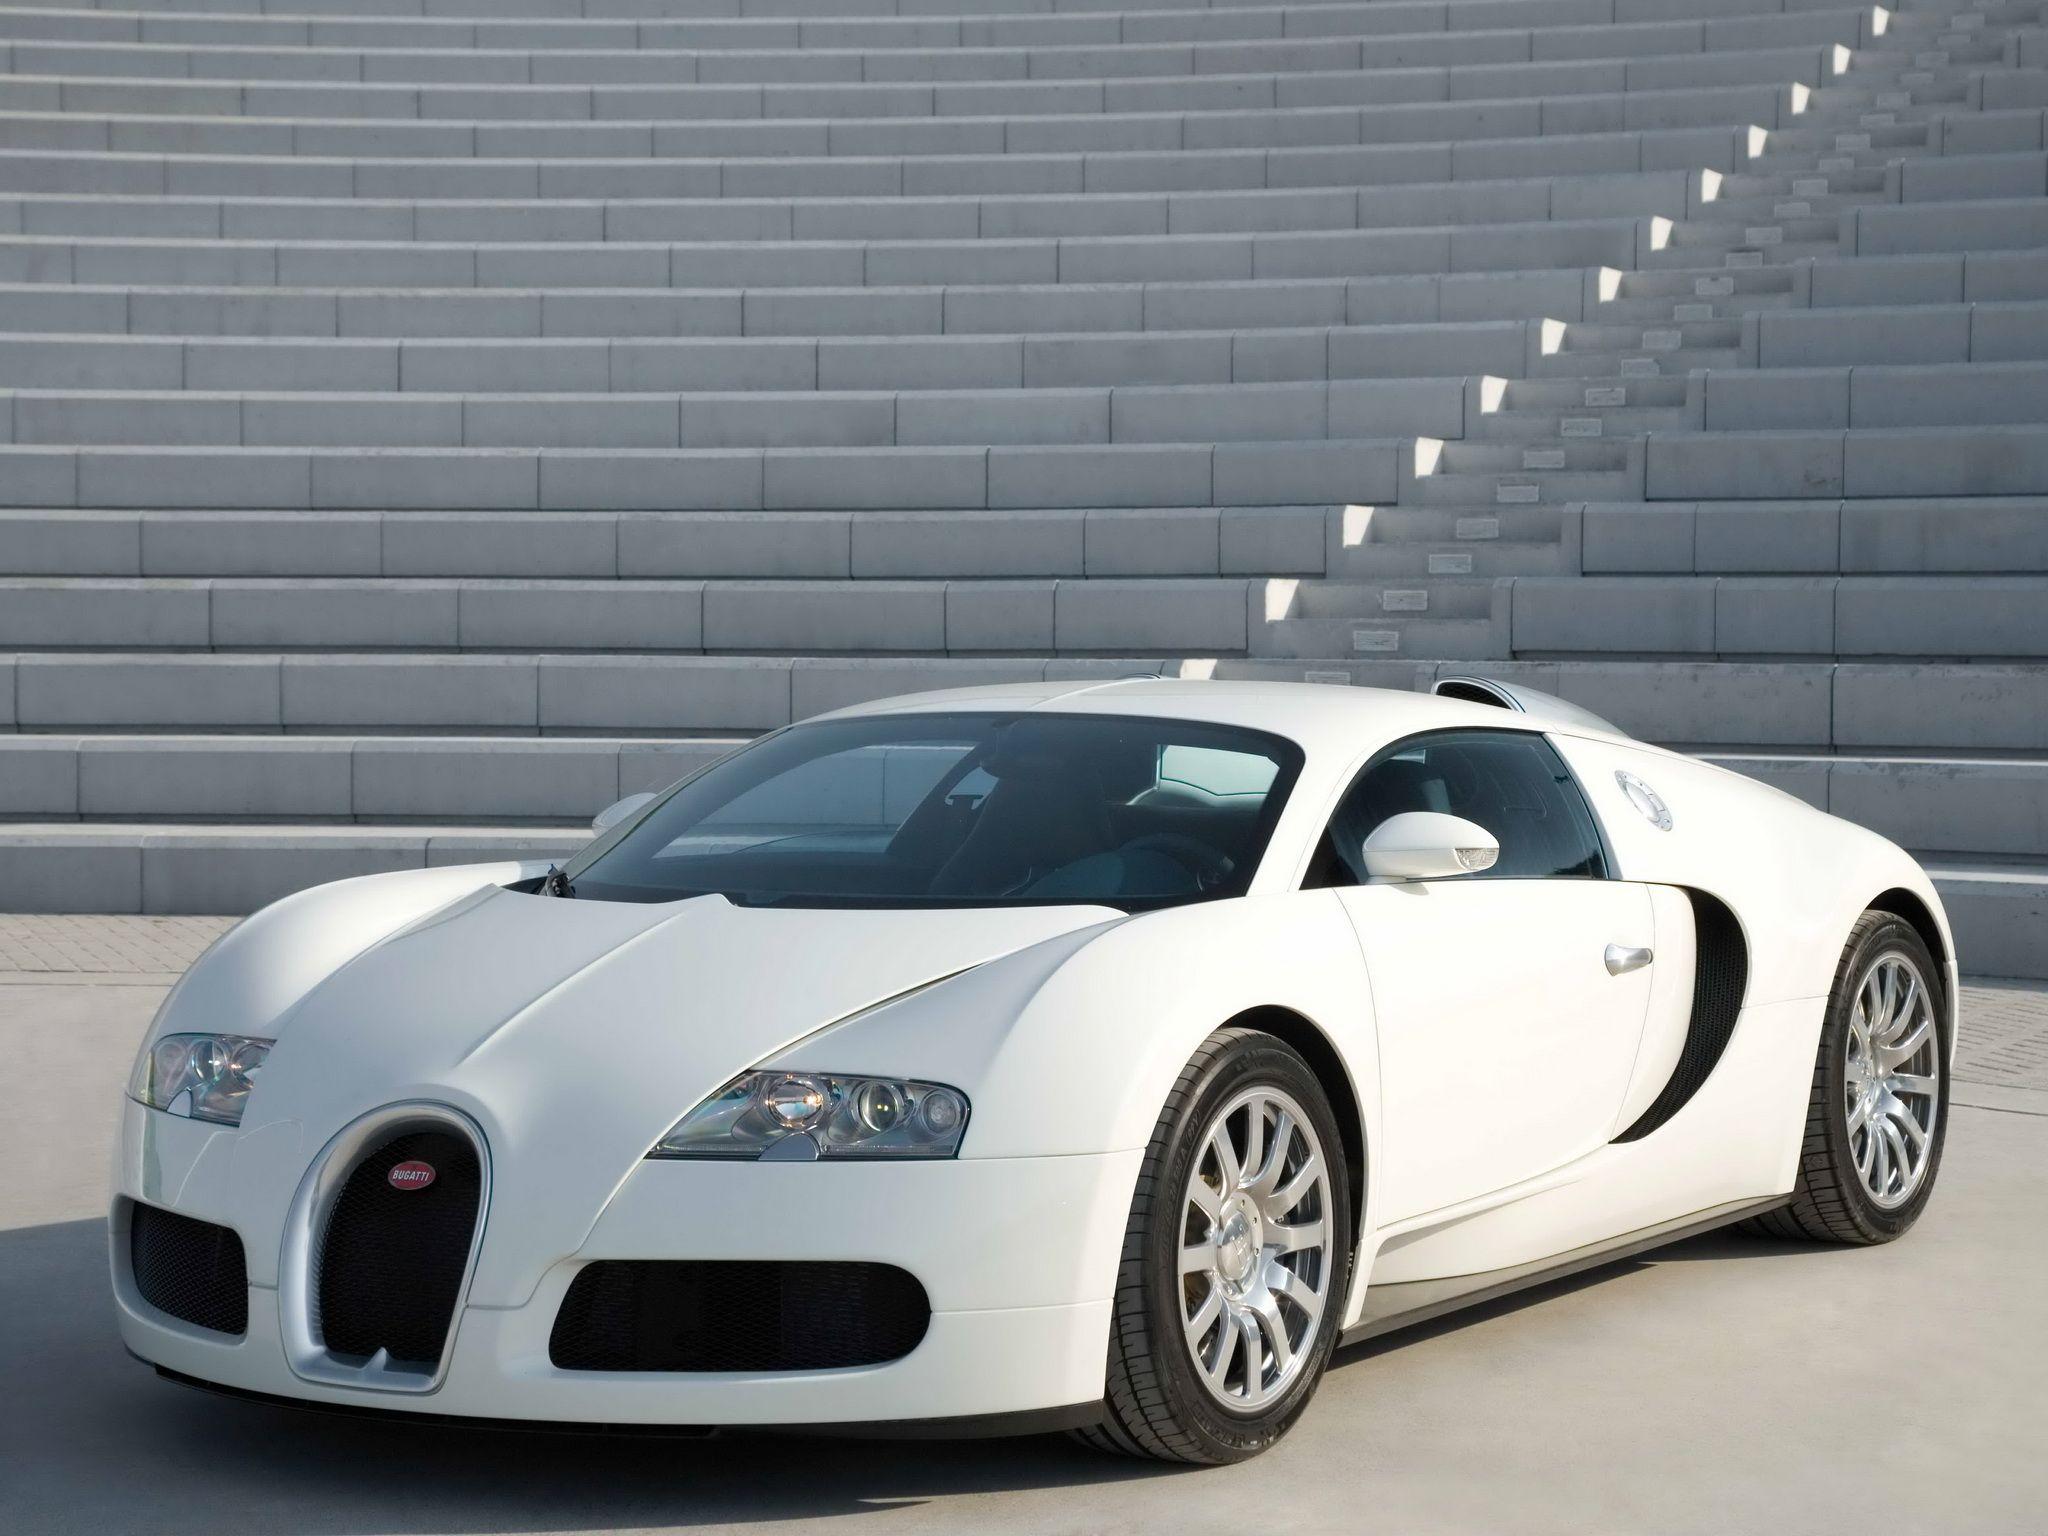 cea9b48e7fd7c5edafb6531b44851228 Fabulous Bugatti Veyron Price In south Africa Cars Trend